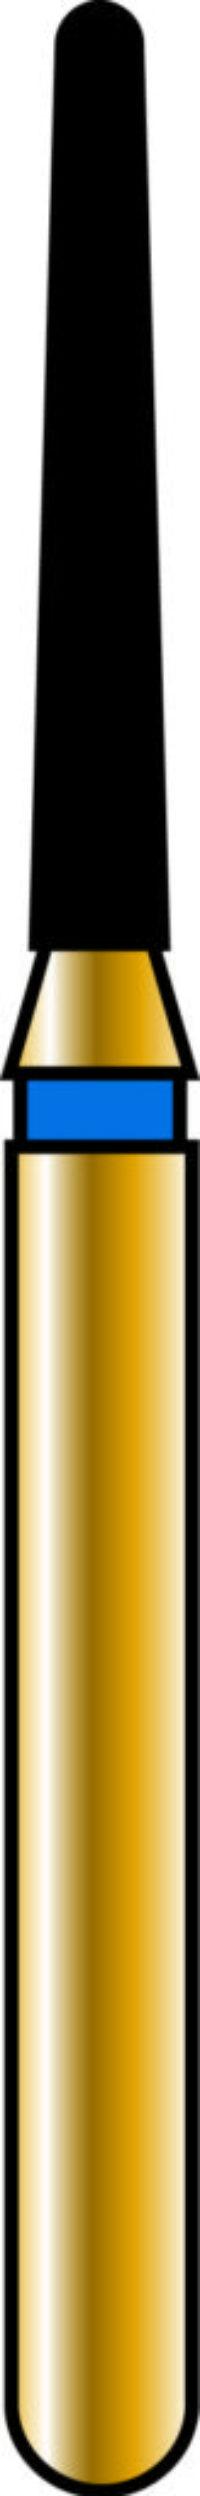 Round End Taper 12-8mm Gold Diamond Bur - Coarse Grit